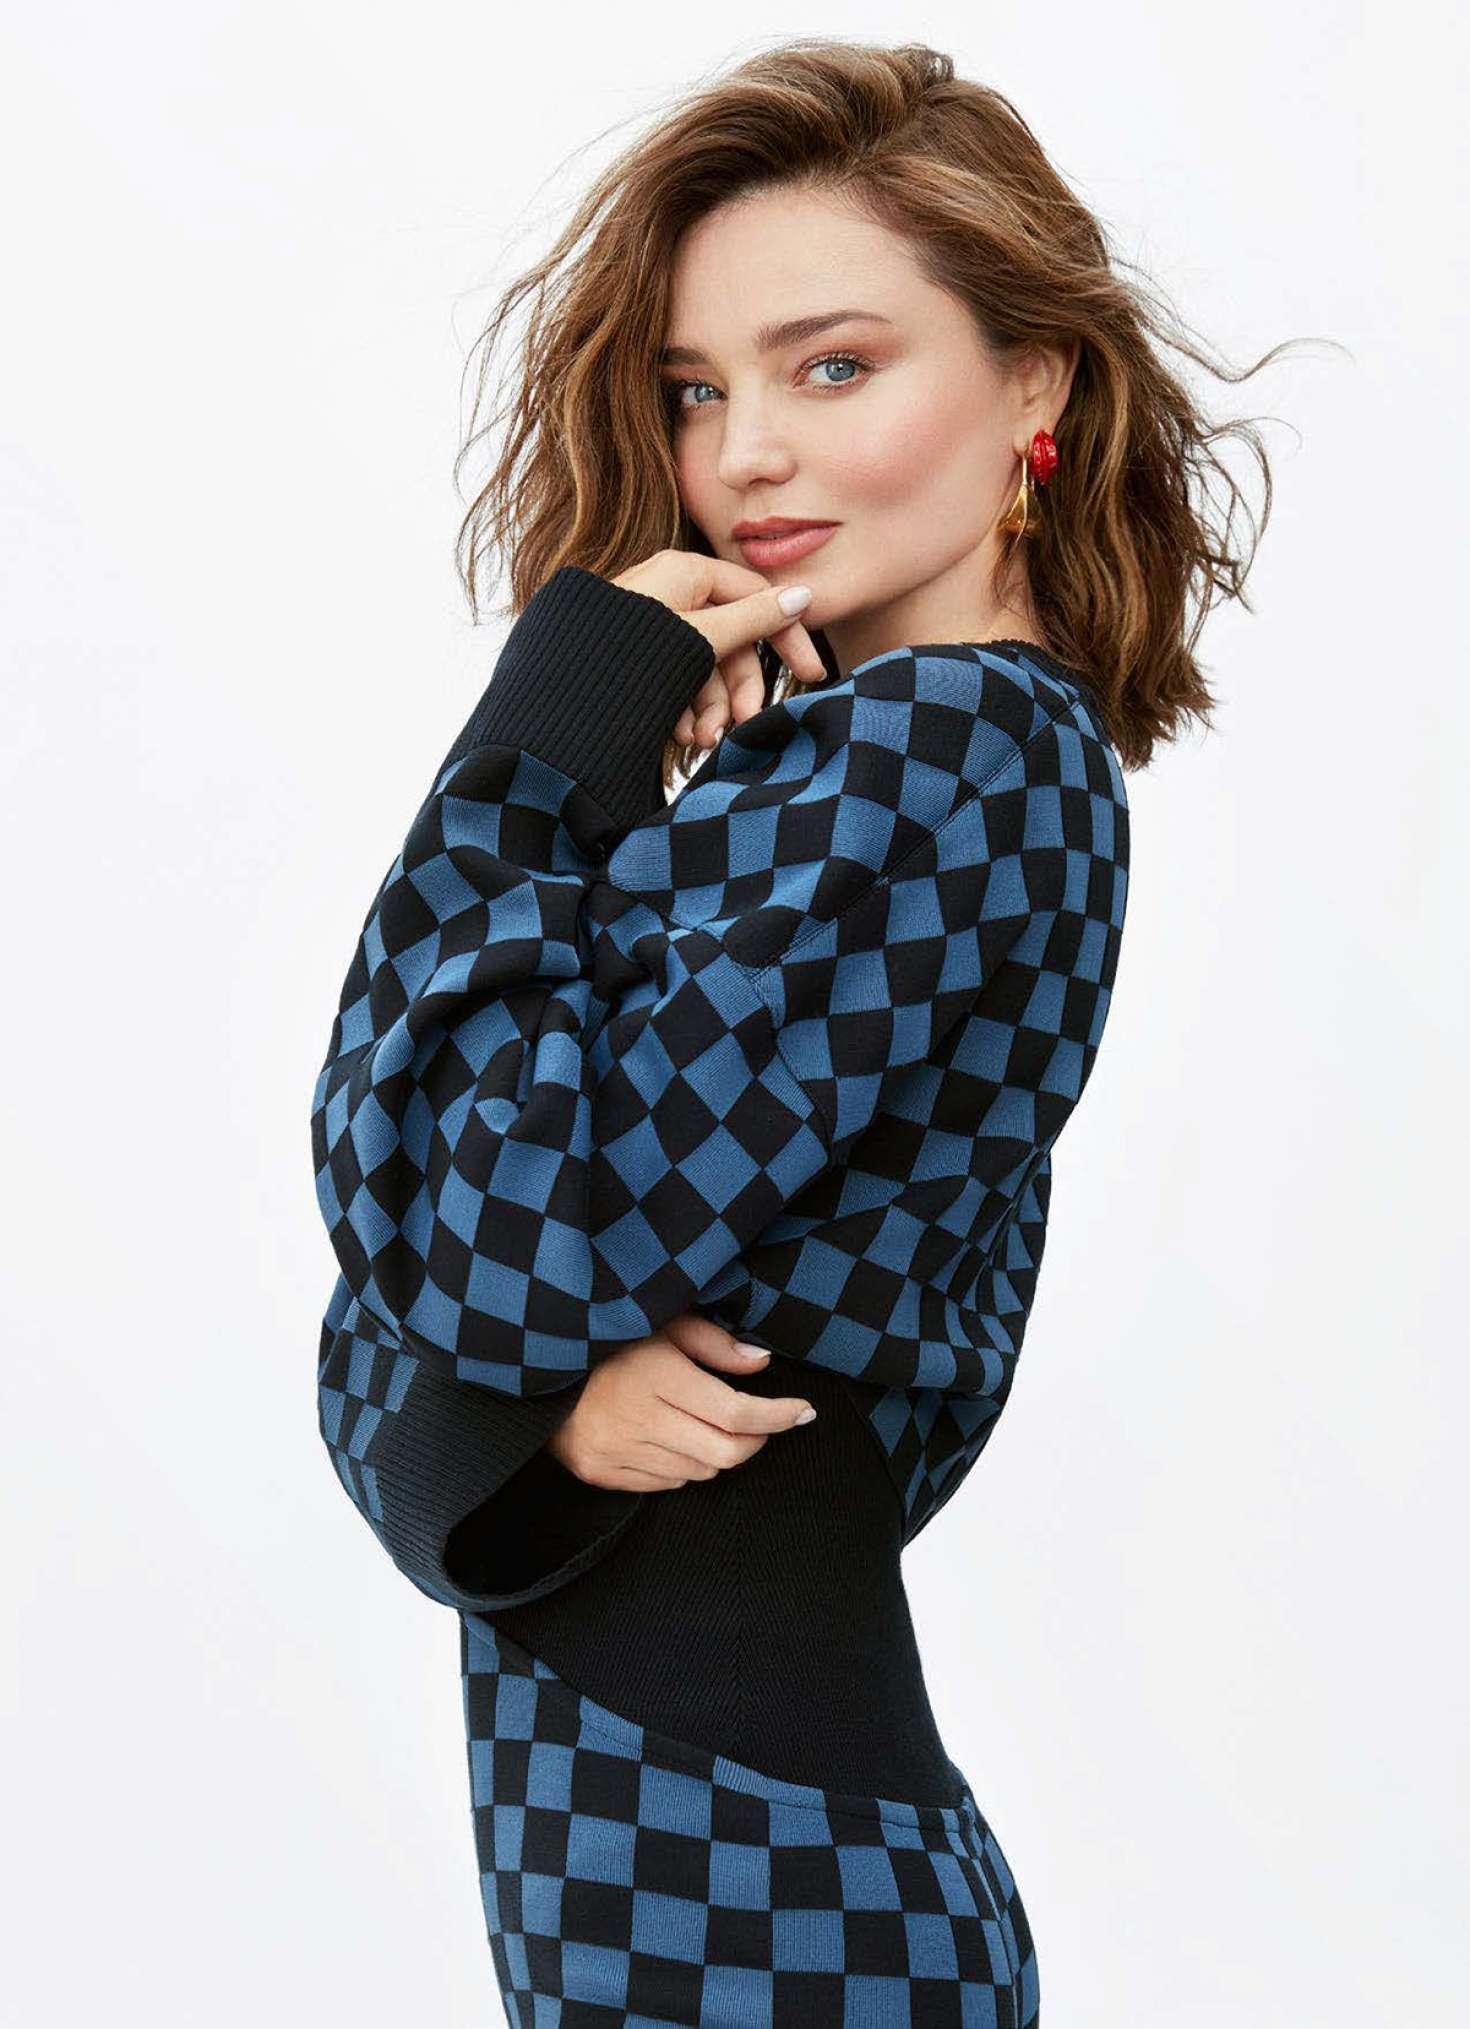 Miranda Kerr 2017 : Miranda Kerr: Harpers Bazaar Australia 2017 -08